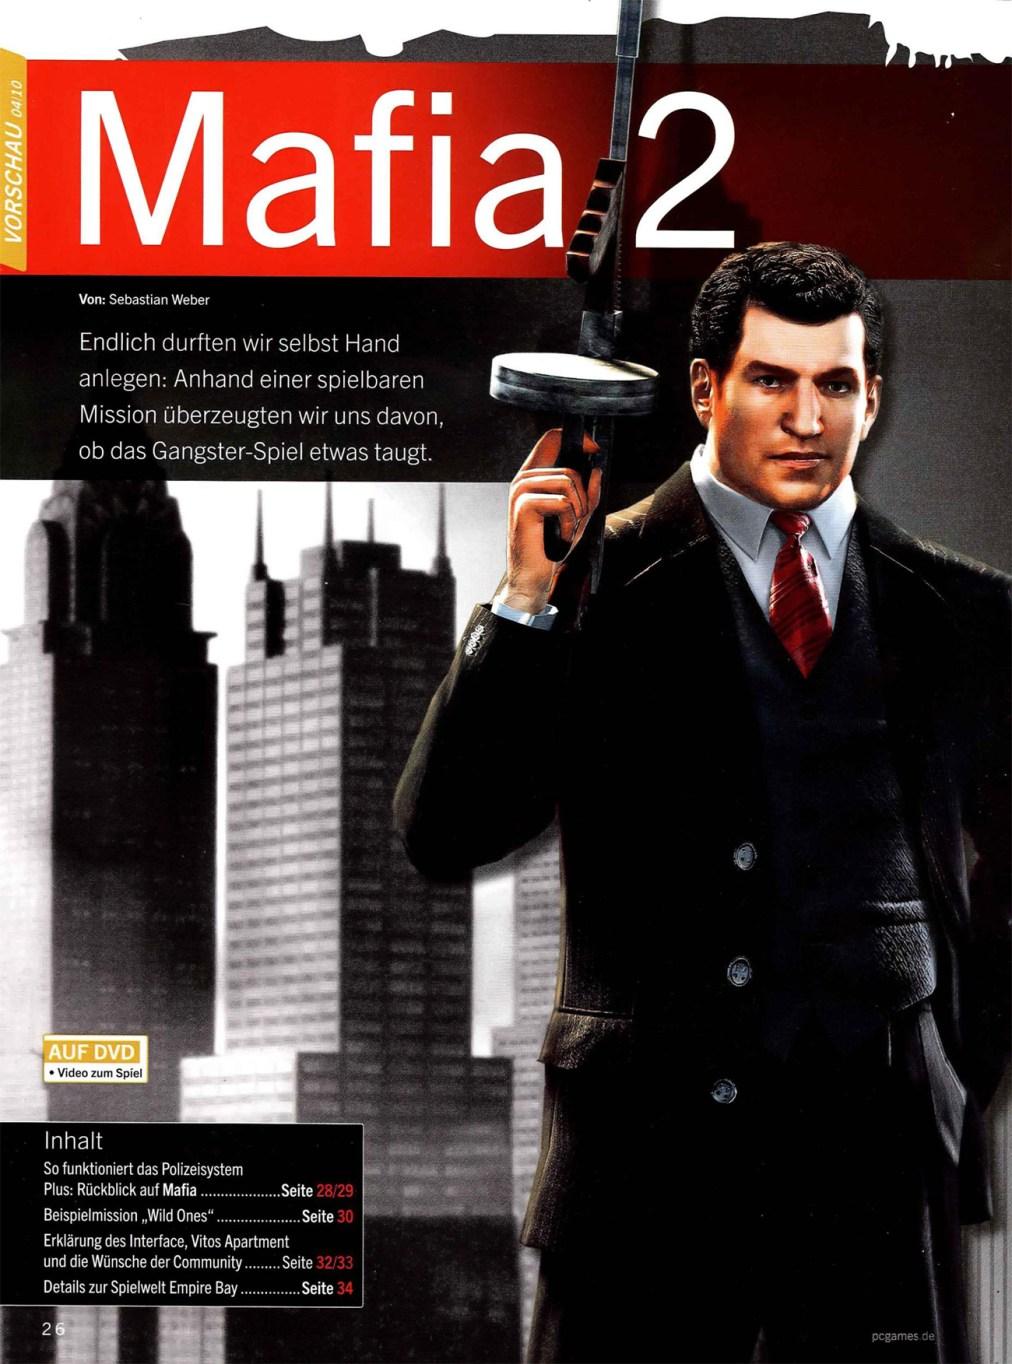 2-mafia-2-scans-screenshots